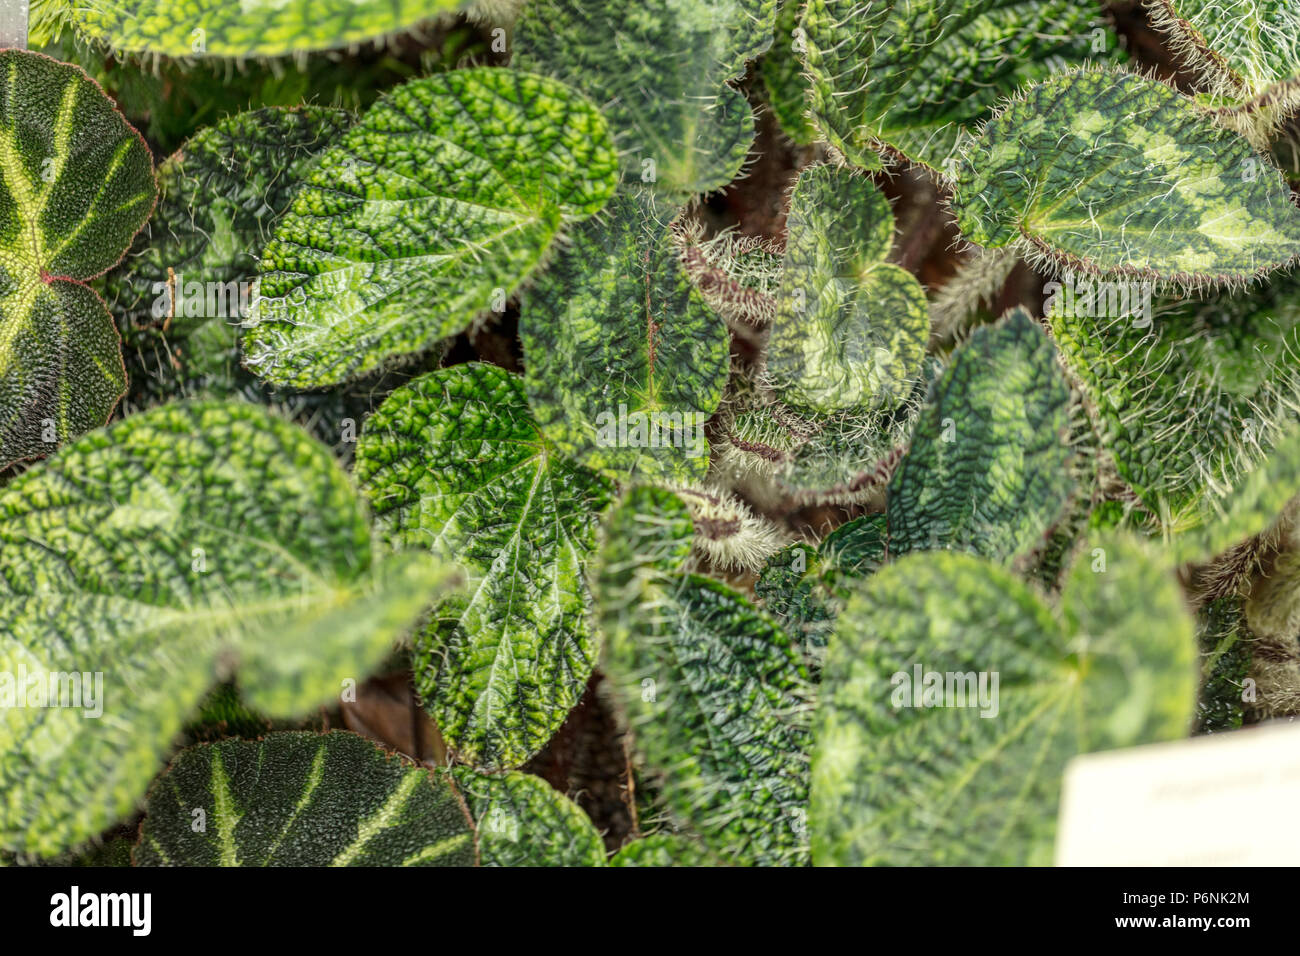 Begonia species, Begonia longiciliata (Begonia sizemoreae) - Stock Image